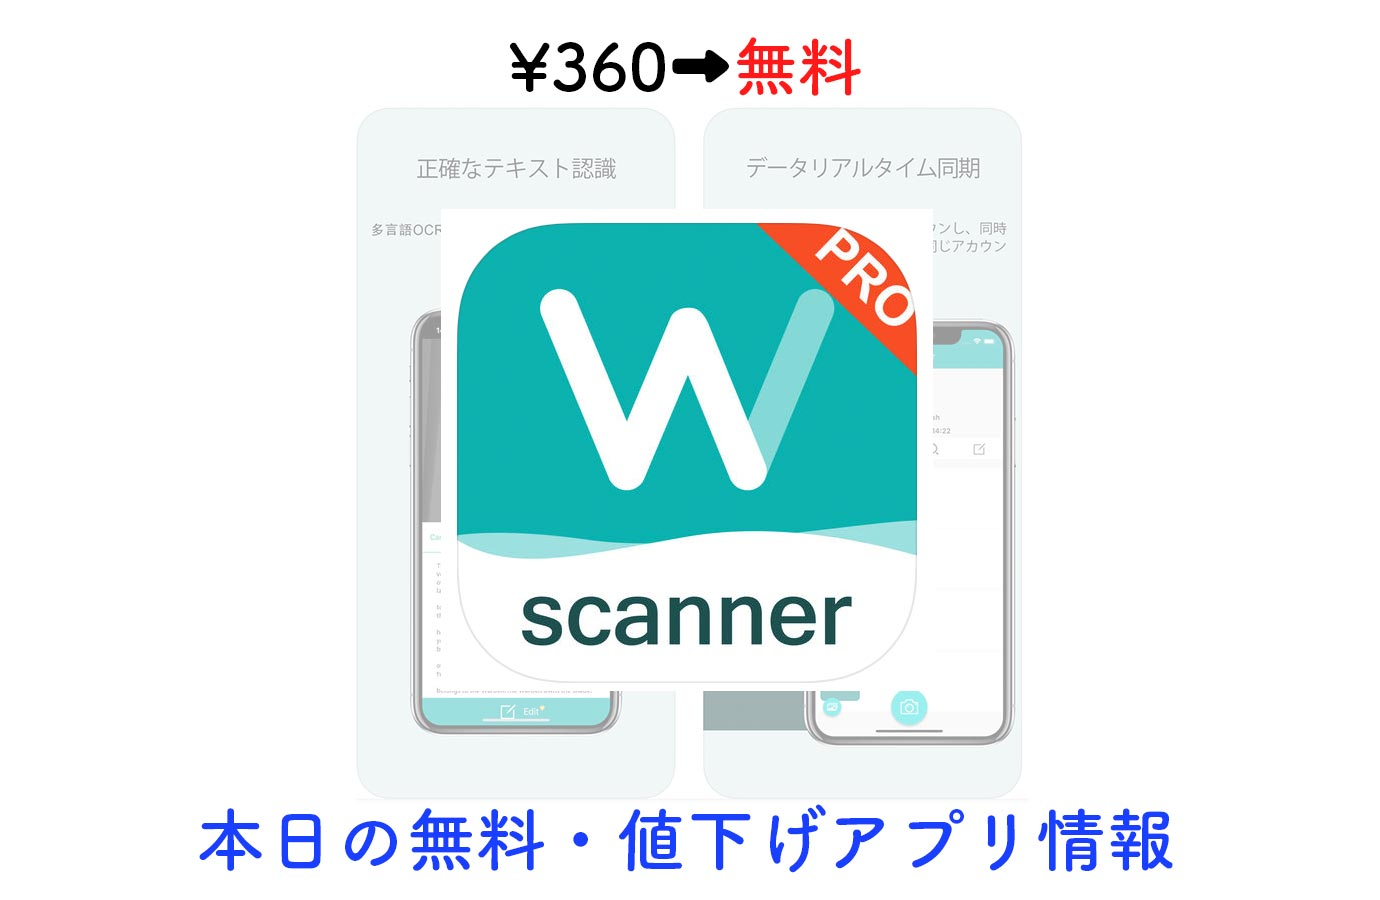 Appsale0425